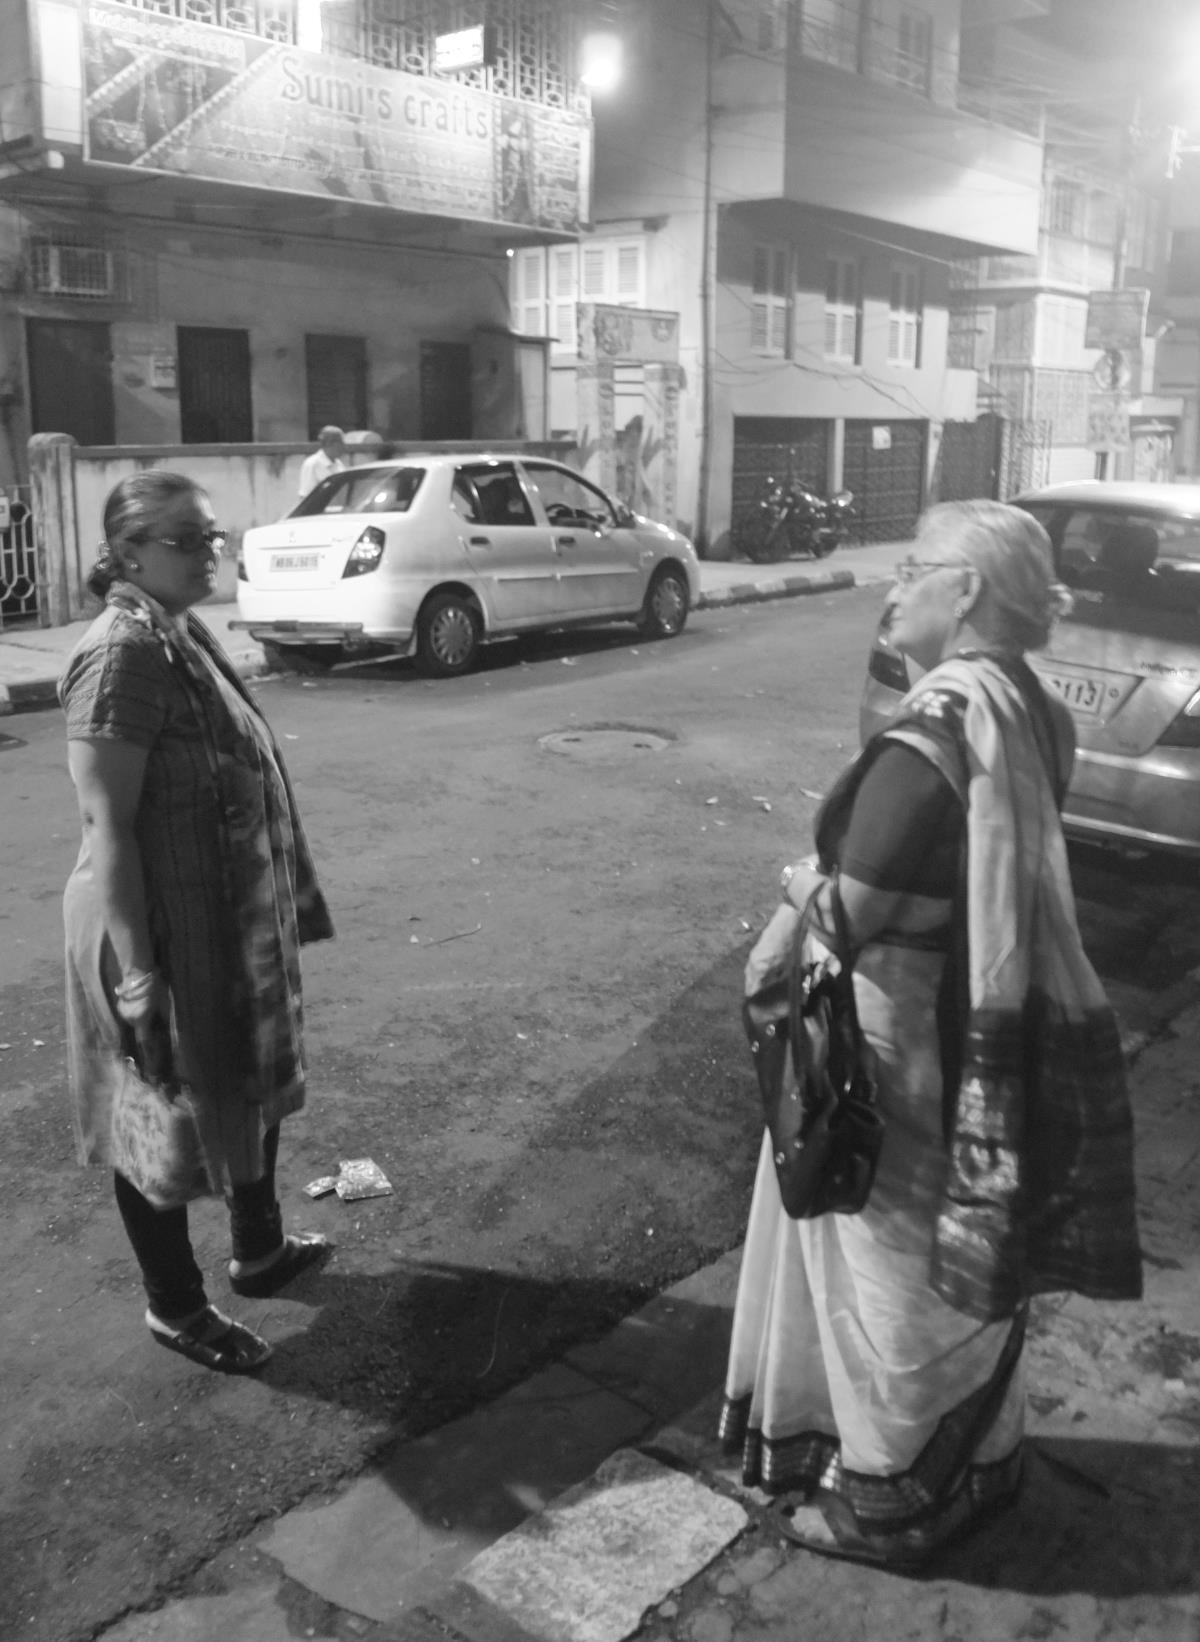 manjira and her mom (arundhati), near byloom, calcutta, july 2013